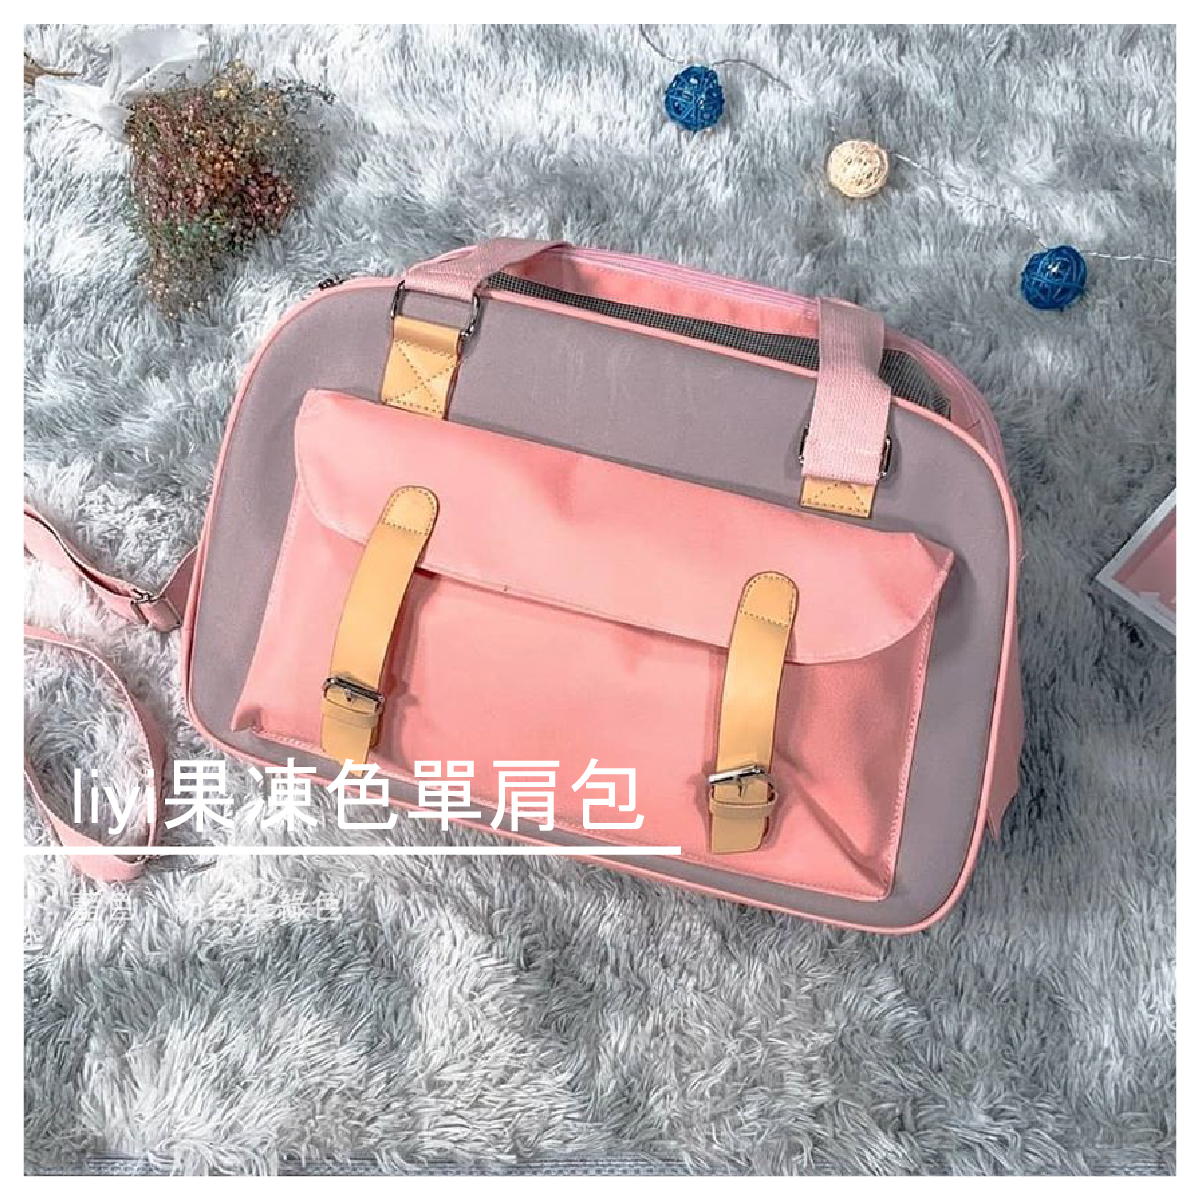 【LIYI 秝誼有限公司】liyi果凍色單肩包